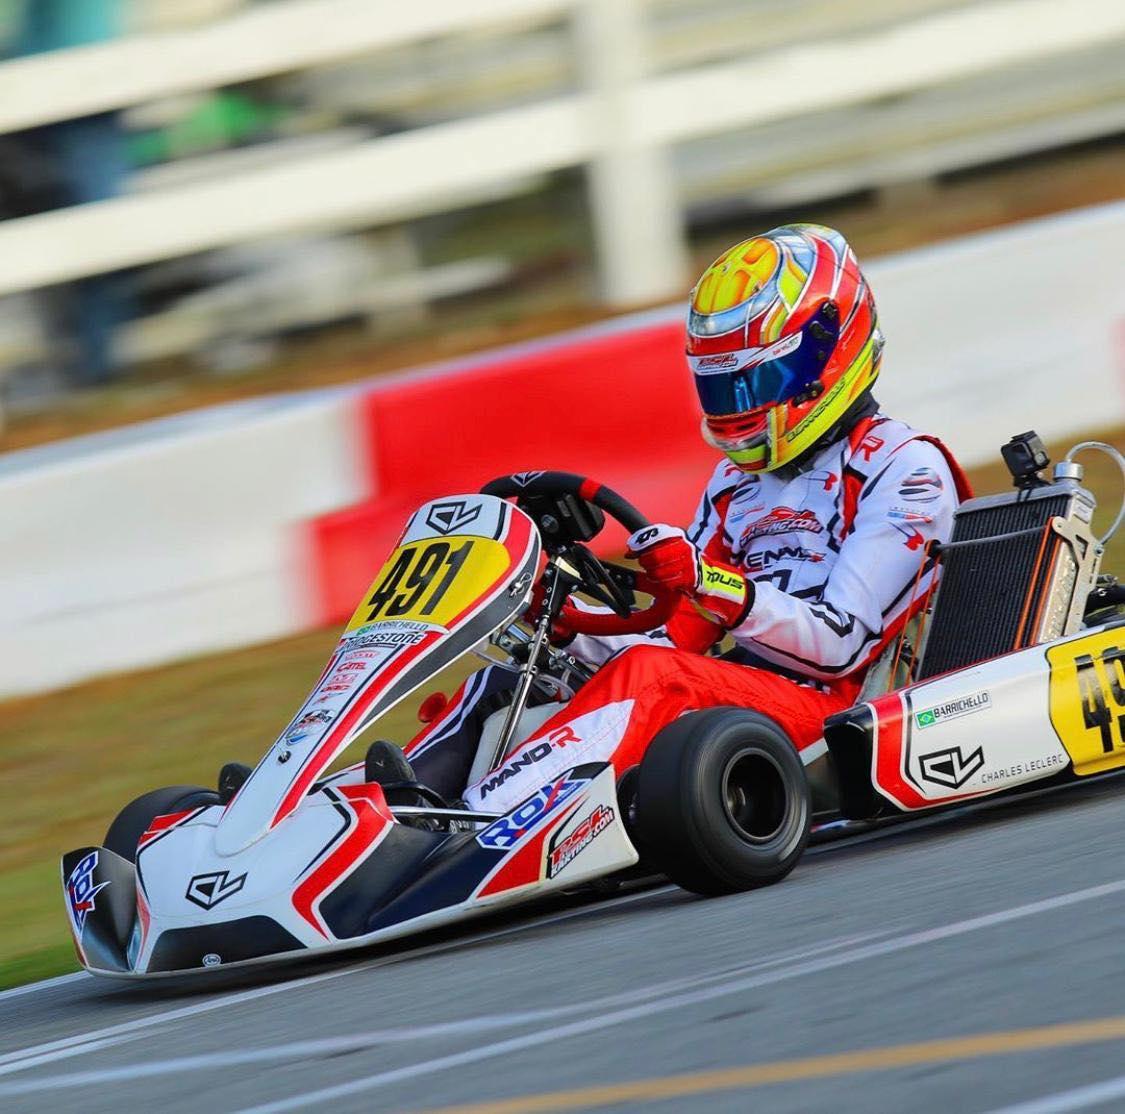 Eduardo Barrichello between KZ and single-seater!